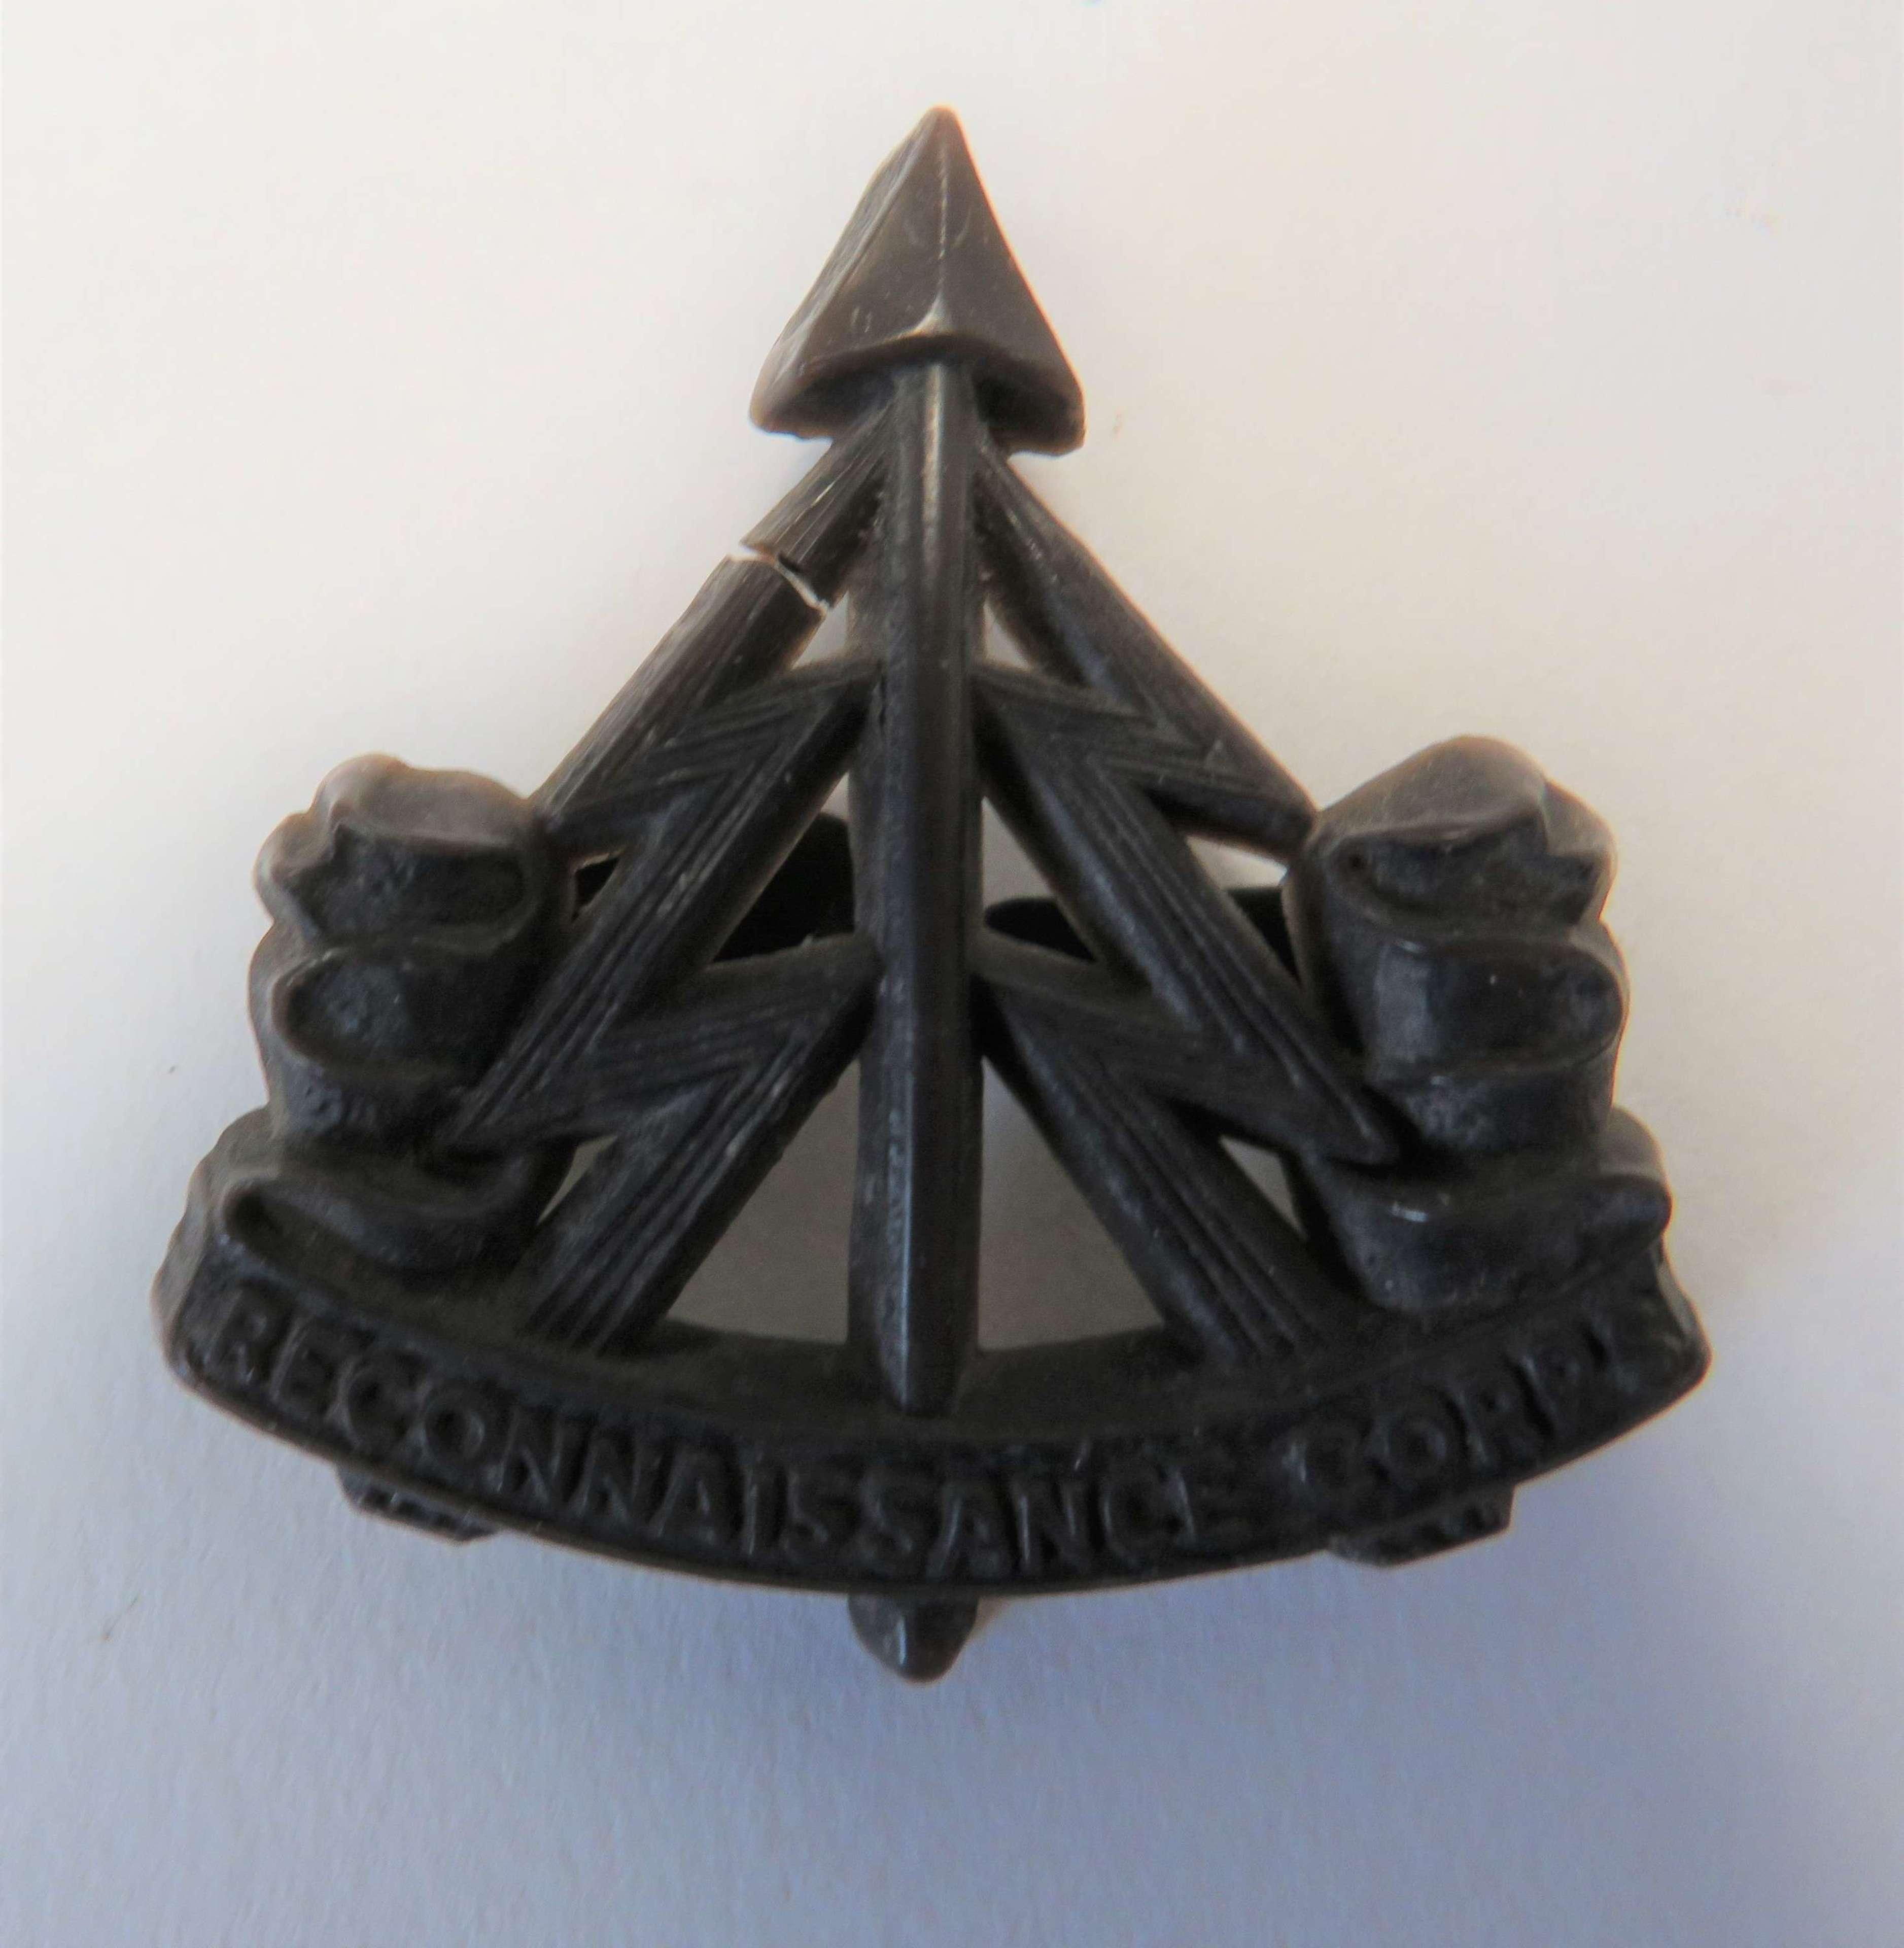 WW2 Reconnaissance Corps Plastic Economy Cap Badge